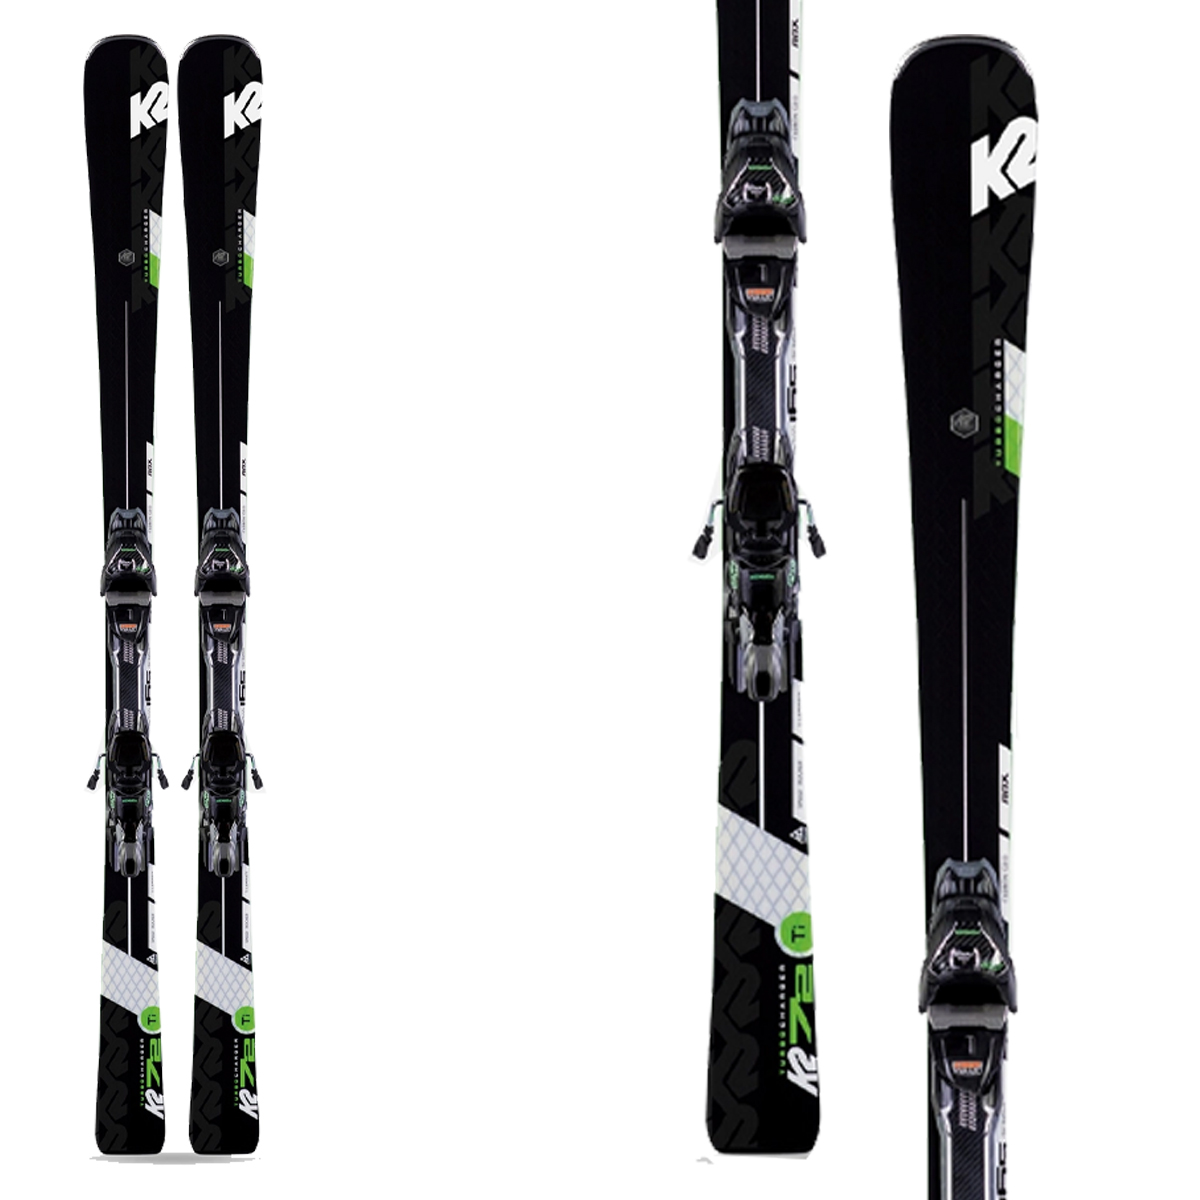 K2 Ski Turbo Charger With Bindings Mxcell 12 Tcx